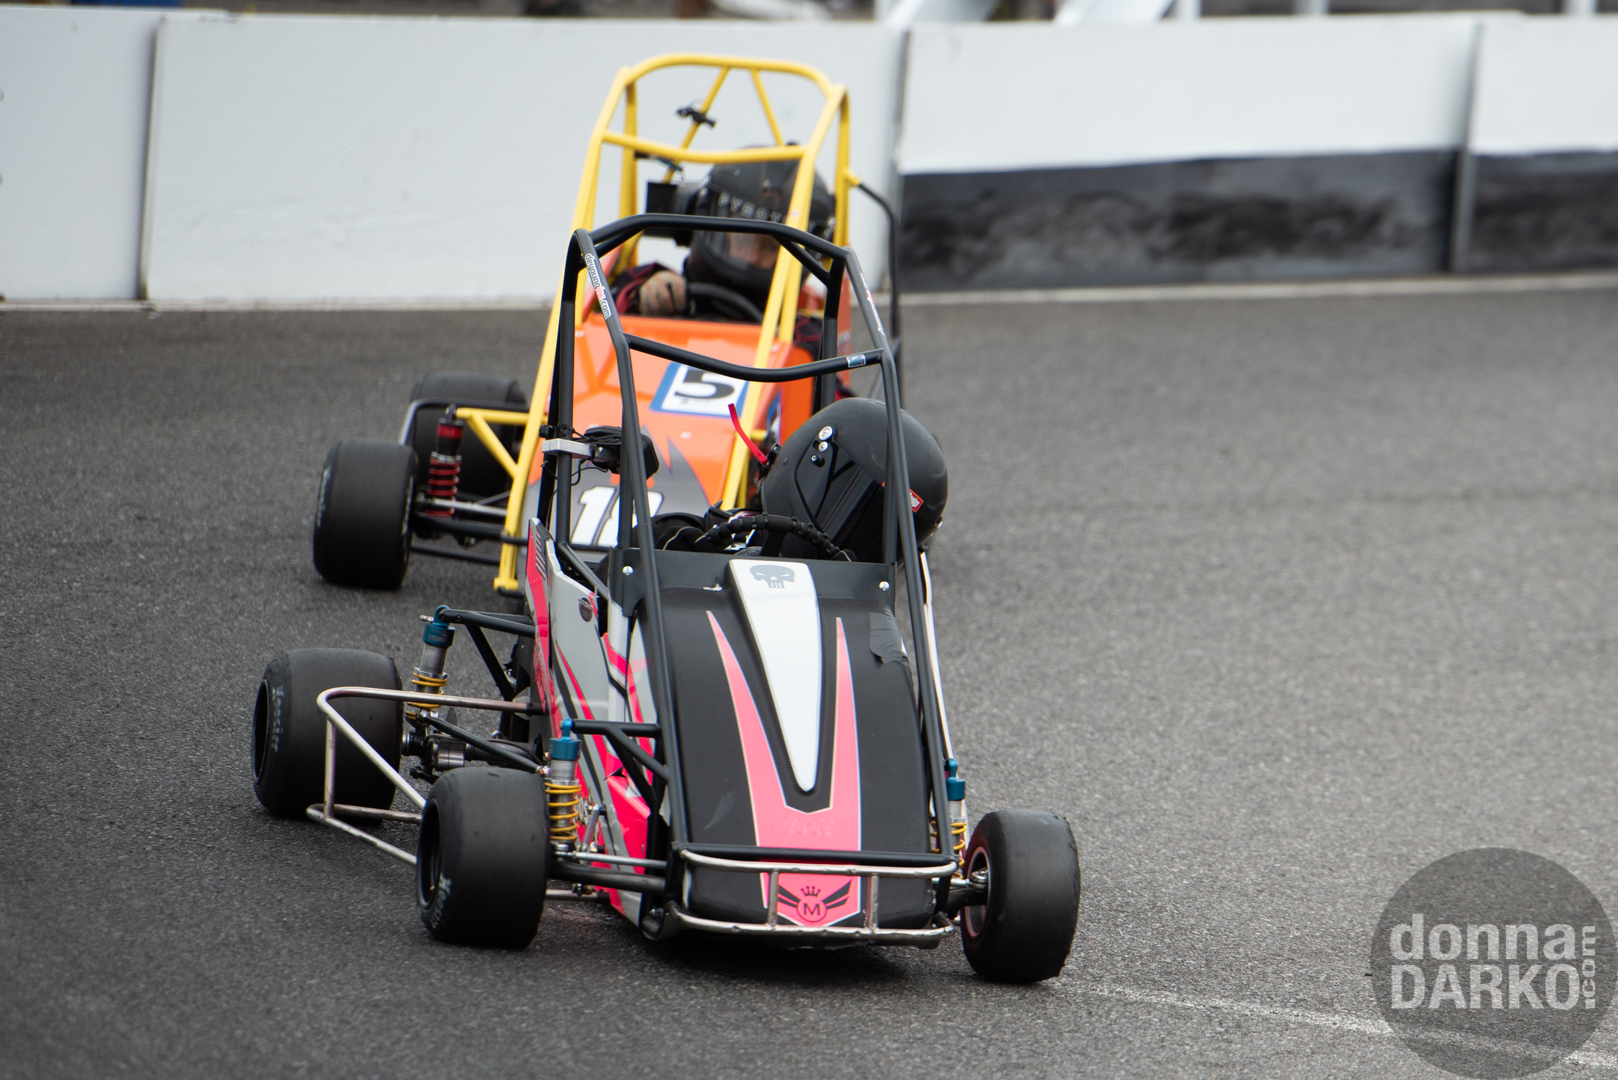 QWMA (Racing) 8-11-2019 DSC_6485.jpg